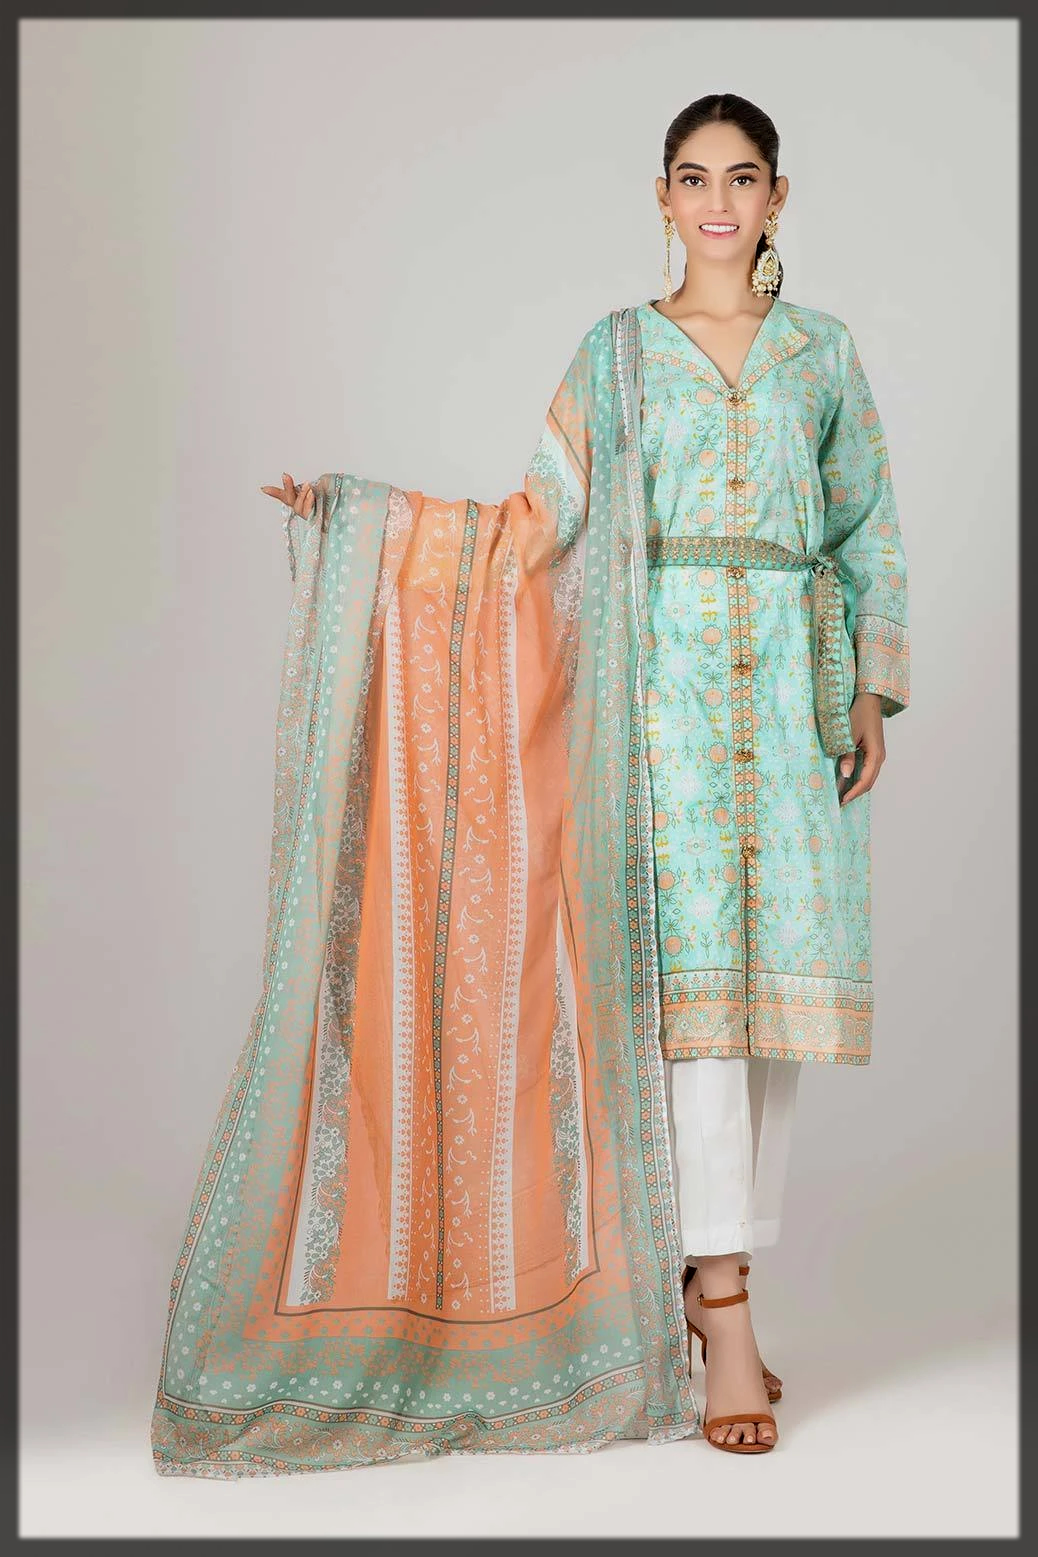 luxury lawn dress for women with chiffon dupatta